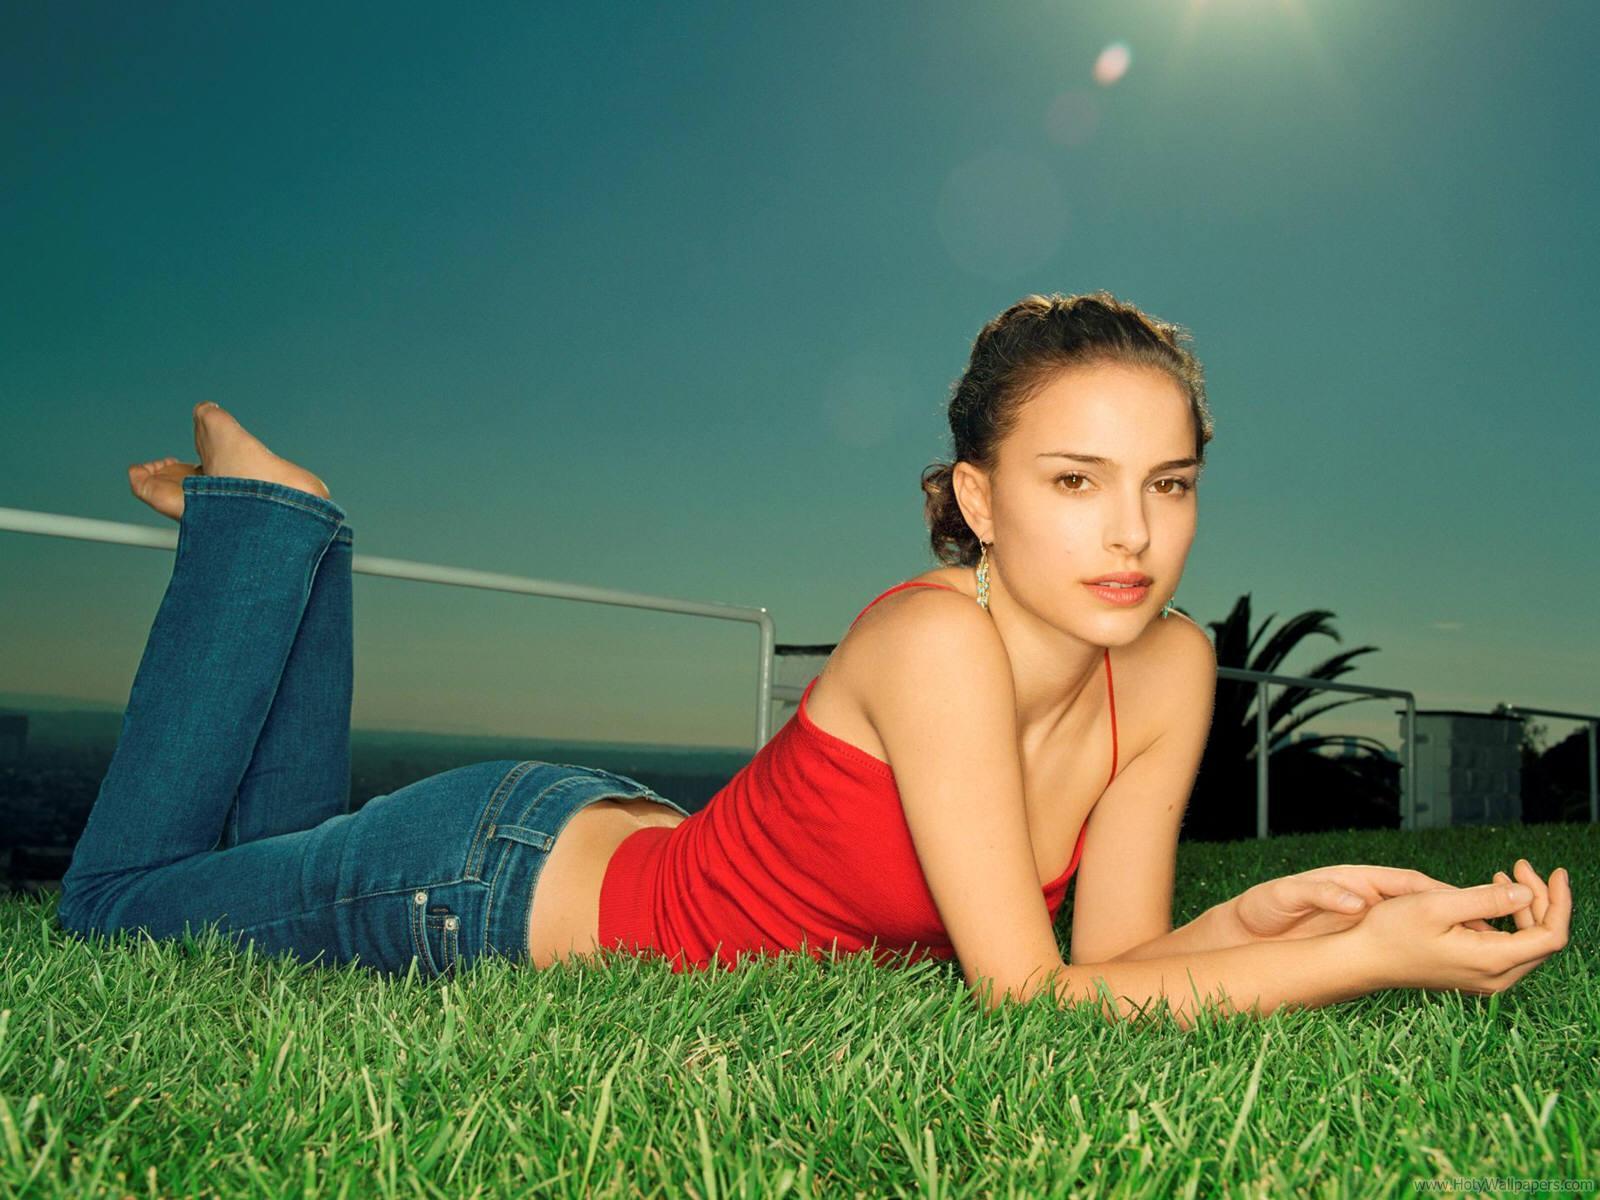 http://4.bp.blogspot.com/-up8bHVVI2DA/Ts39SmDi2xI/AAAAAAAAKkQ/iugfPLFULdU/s1600/natalie_portman_actress_glamor_wallpaper-04-1600x1200.jpg